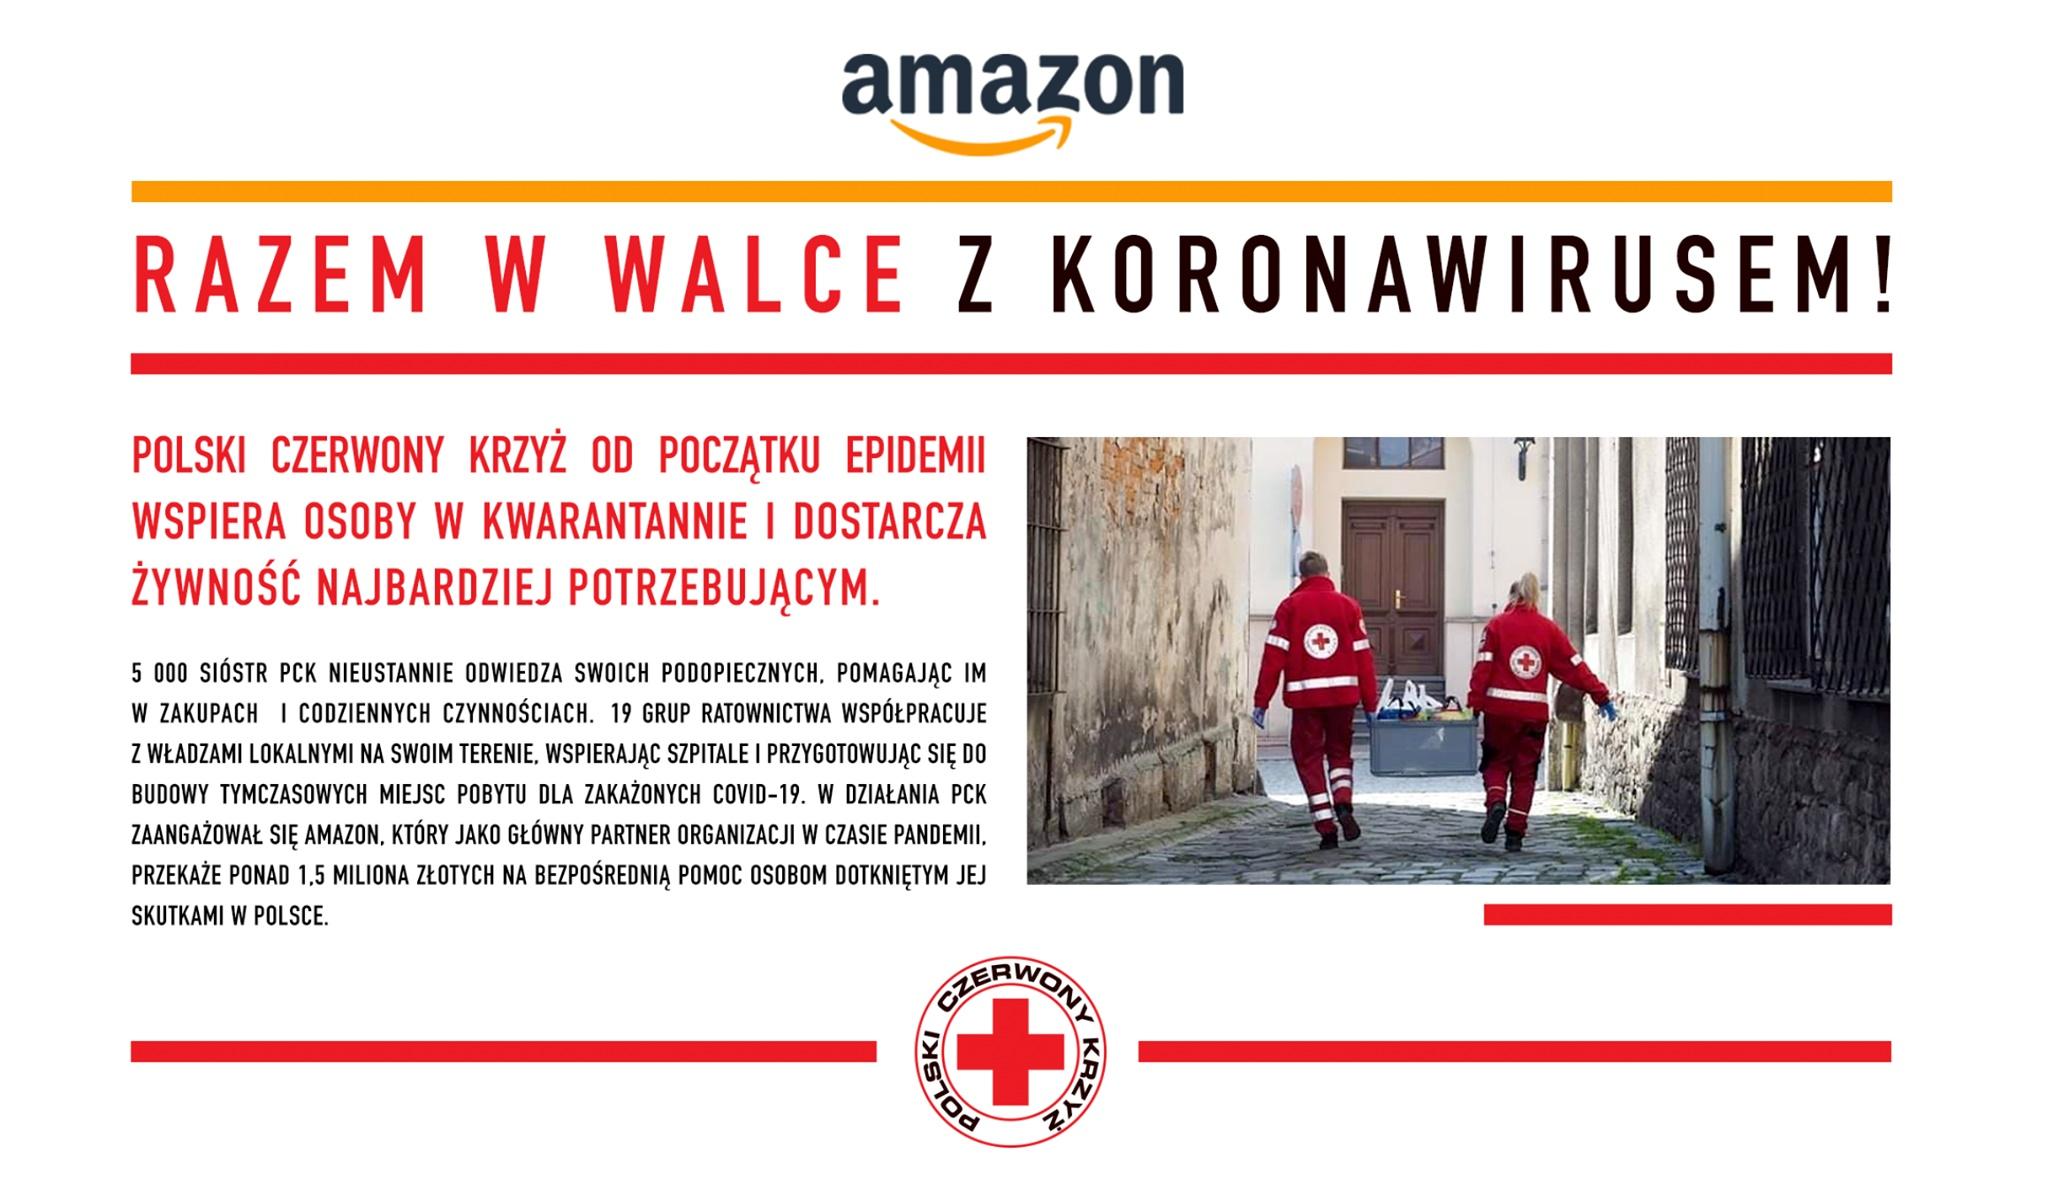 Amazon wspiera PCK